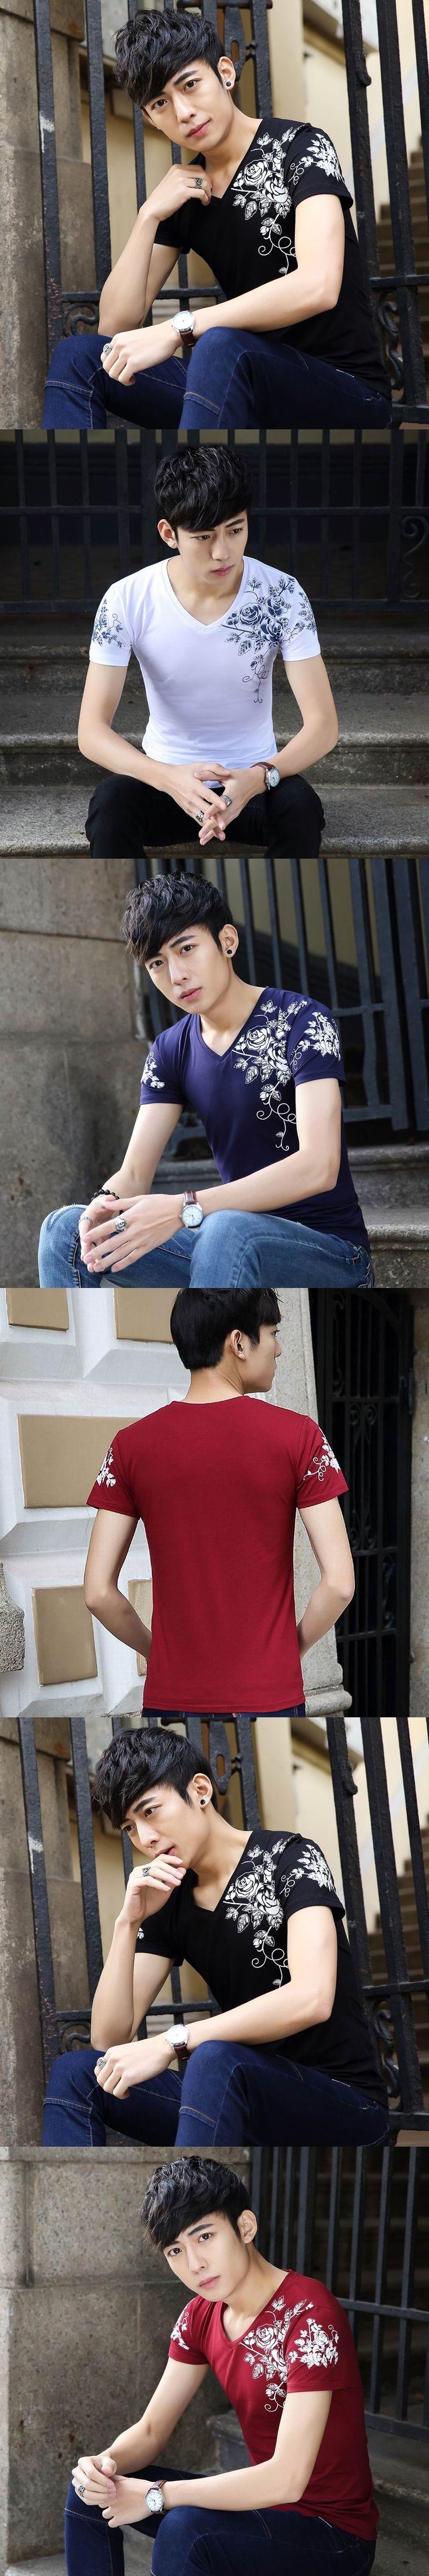 SHIFOPUTI Summer New Style V-neck Print Short Sleeve Slim Fashion Casual Men's Brand Clothing T-shirt High-end Popular Tops Tee